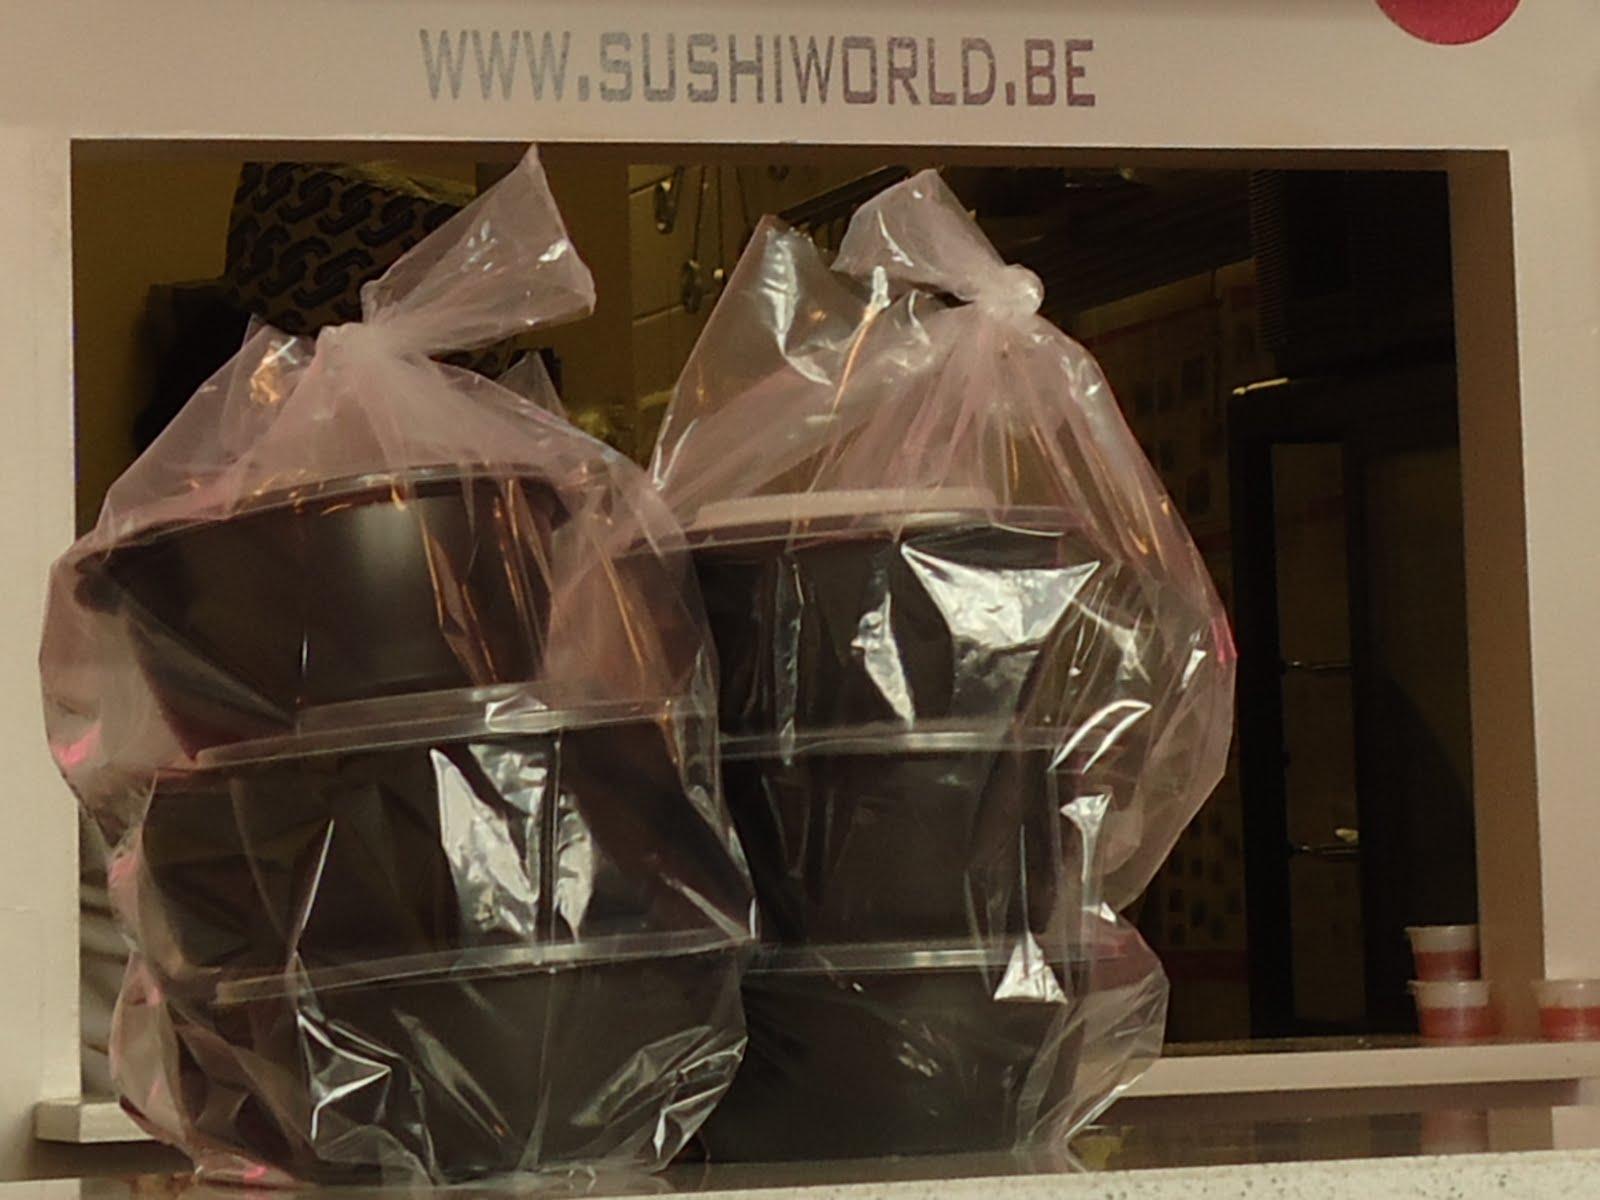 http://3.bp.blogspot.com/-28Dr7N_aeDg/TeZHPzXfRKI/AAAAAAAAAYU/HMKl7Ja_EHw/s1600/sushiworld11.JPG